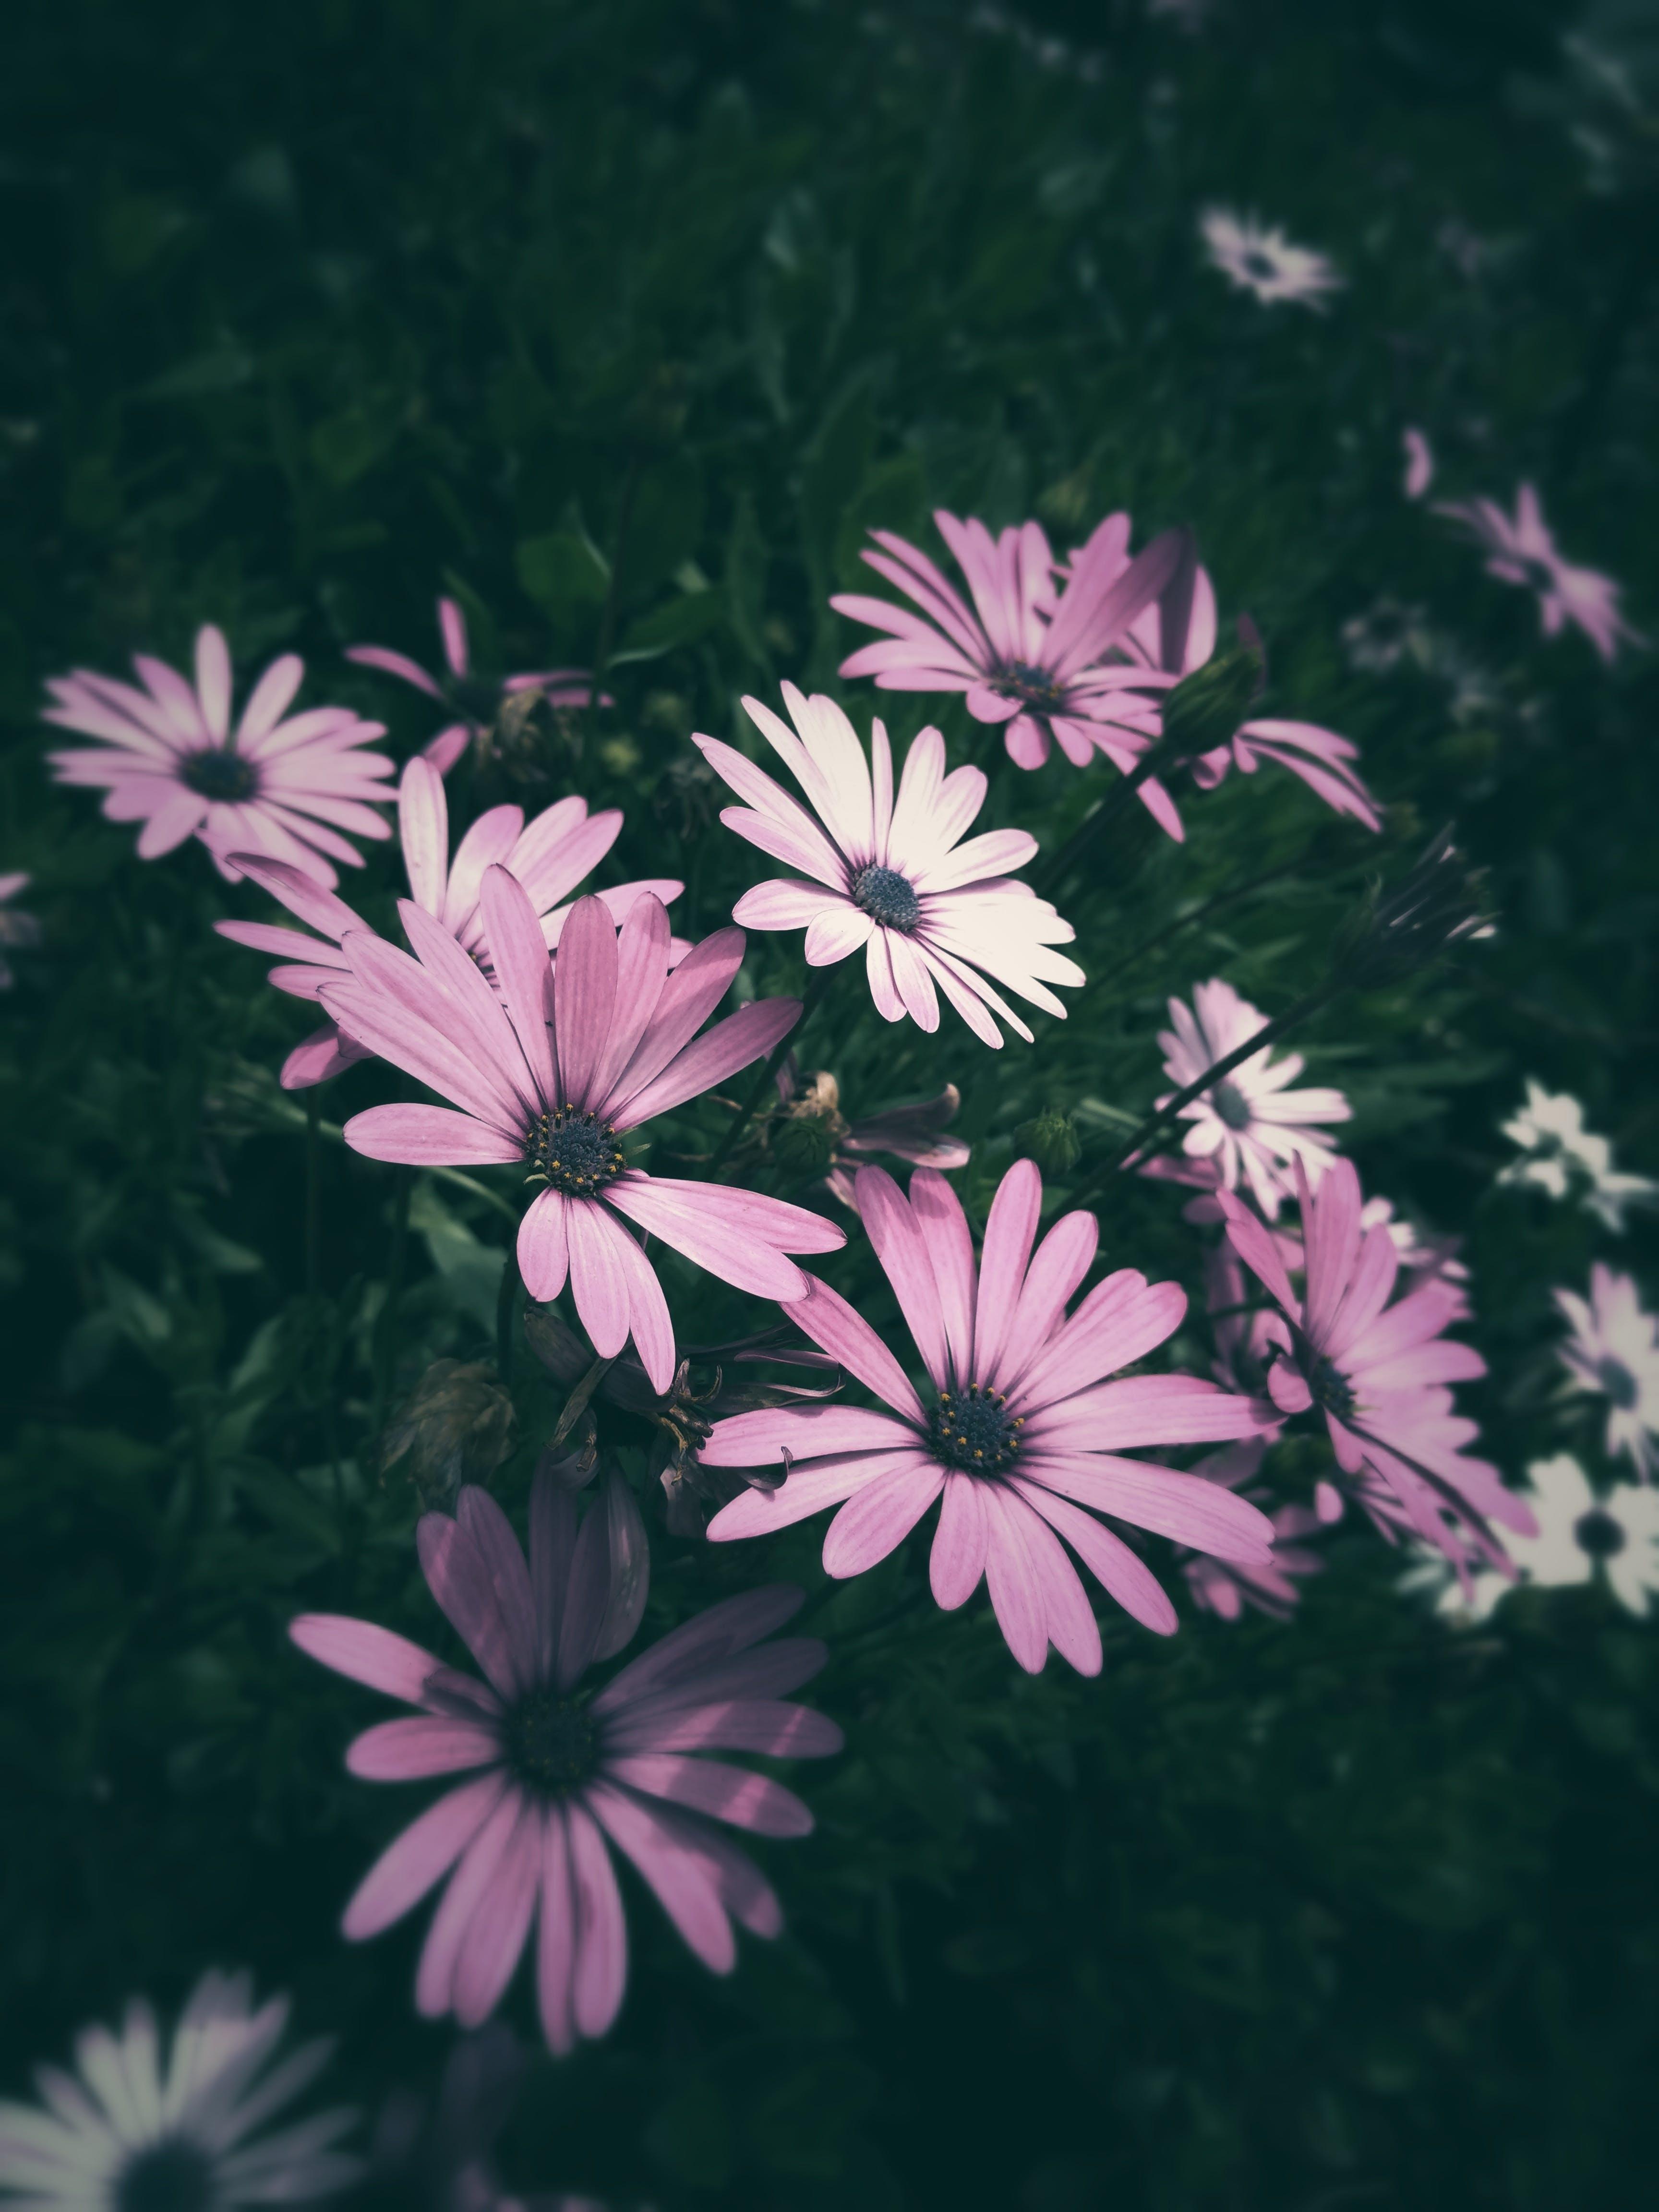 Purple Petaled Flowers Close-up Photo